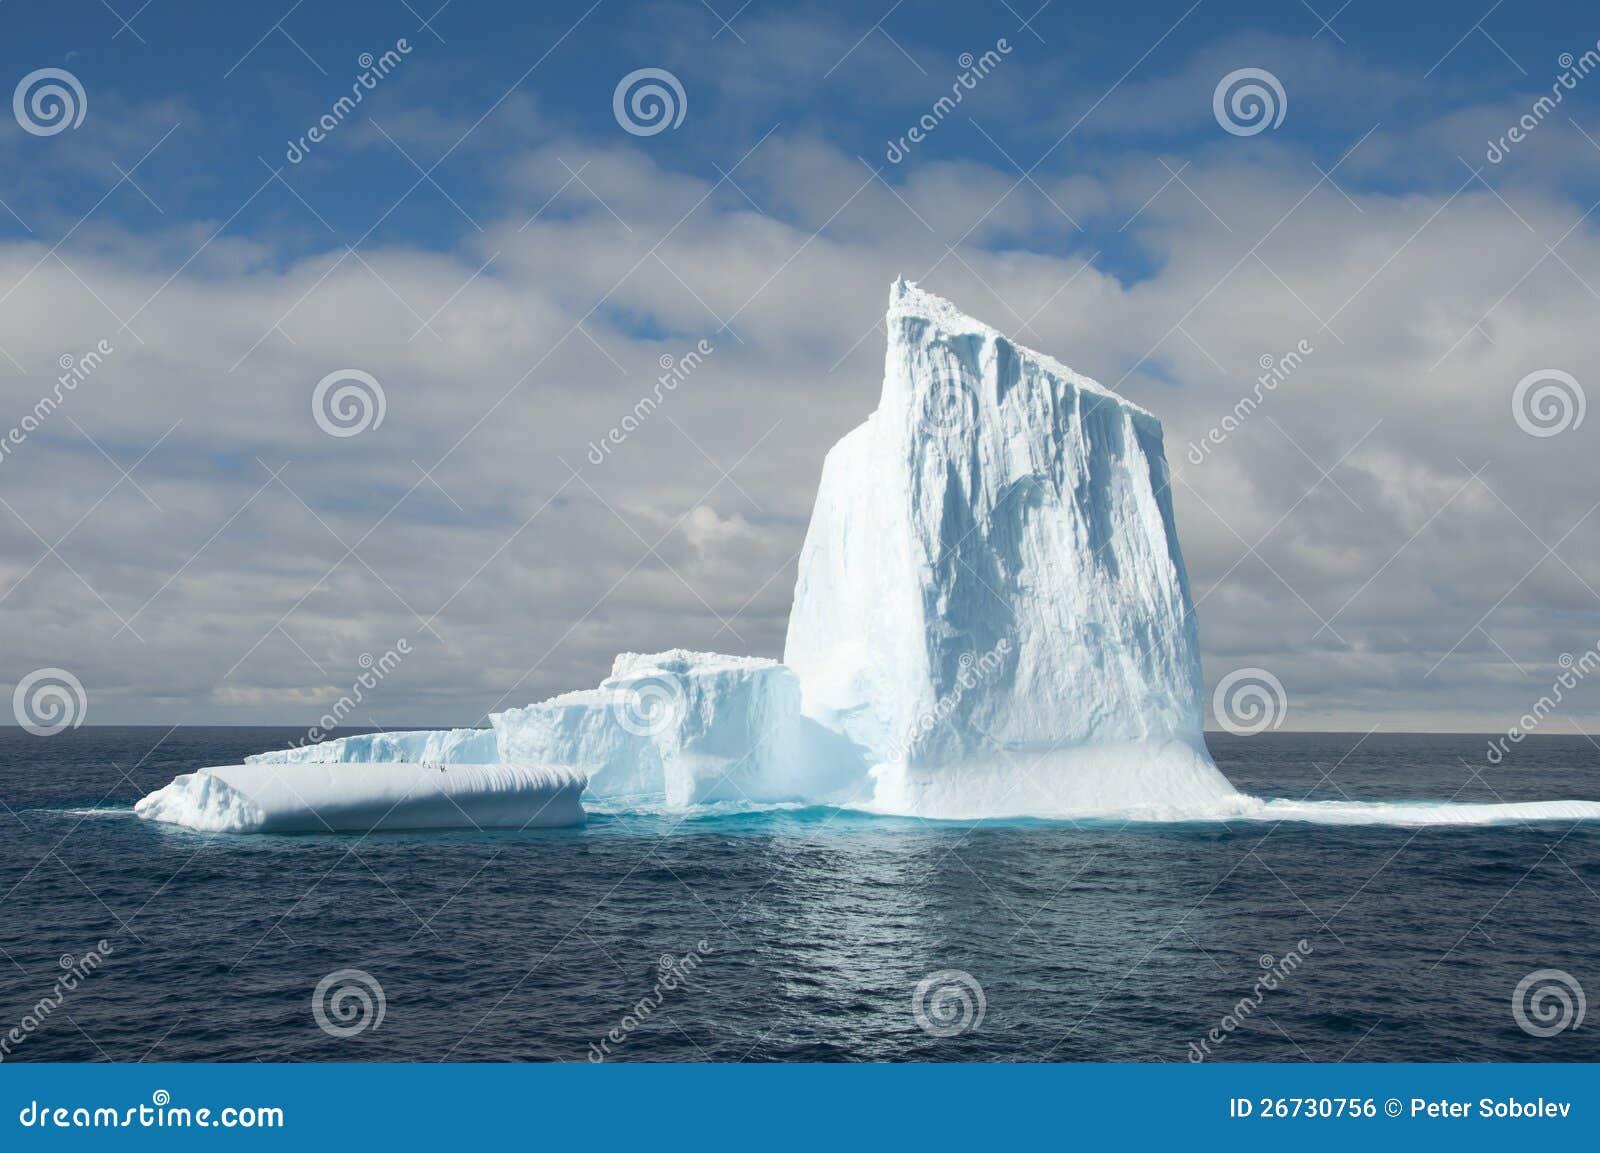 Big iceberg in Antarctica